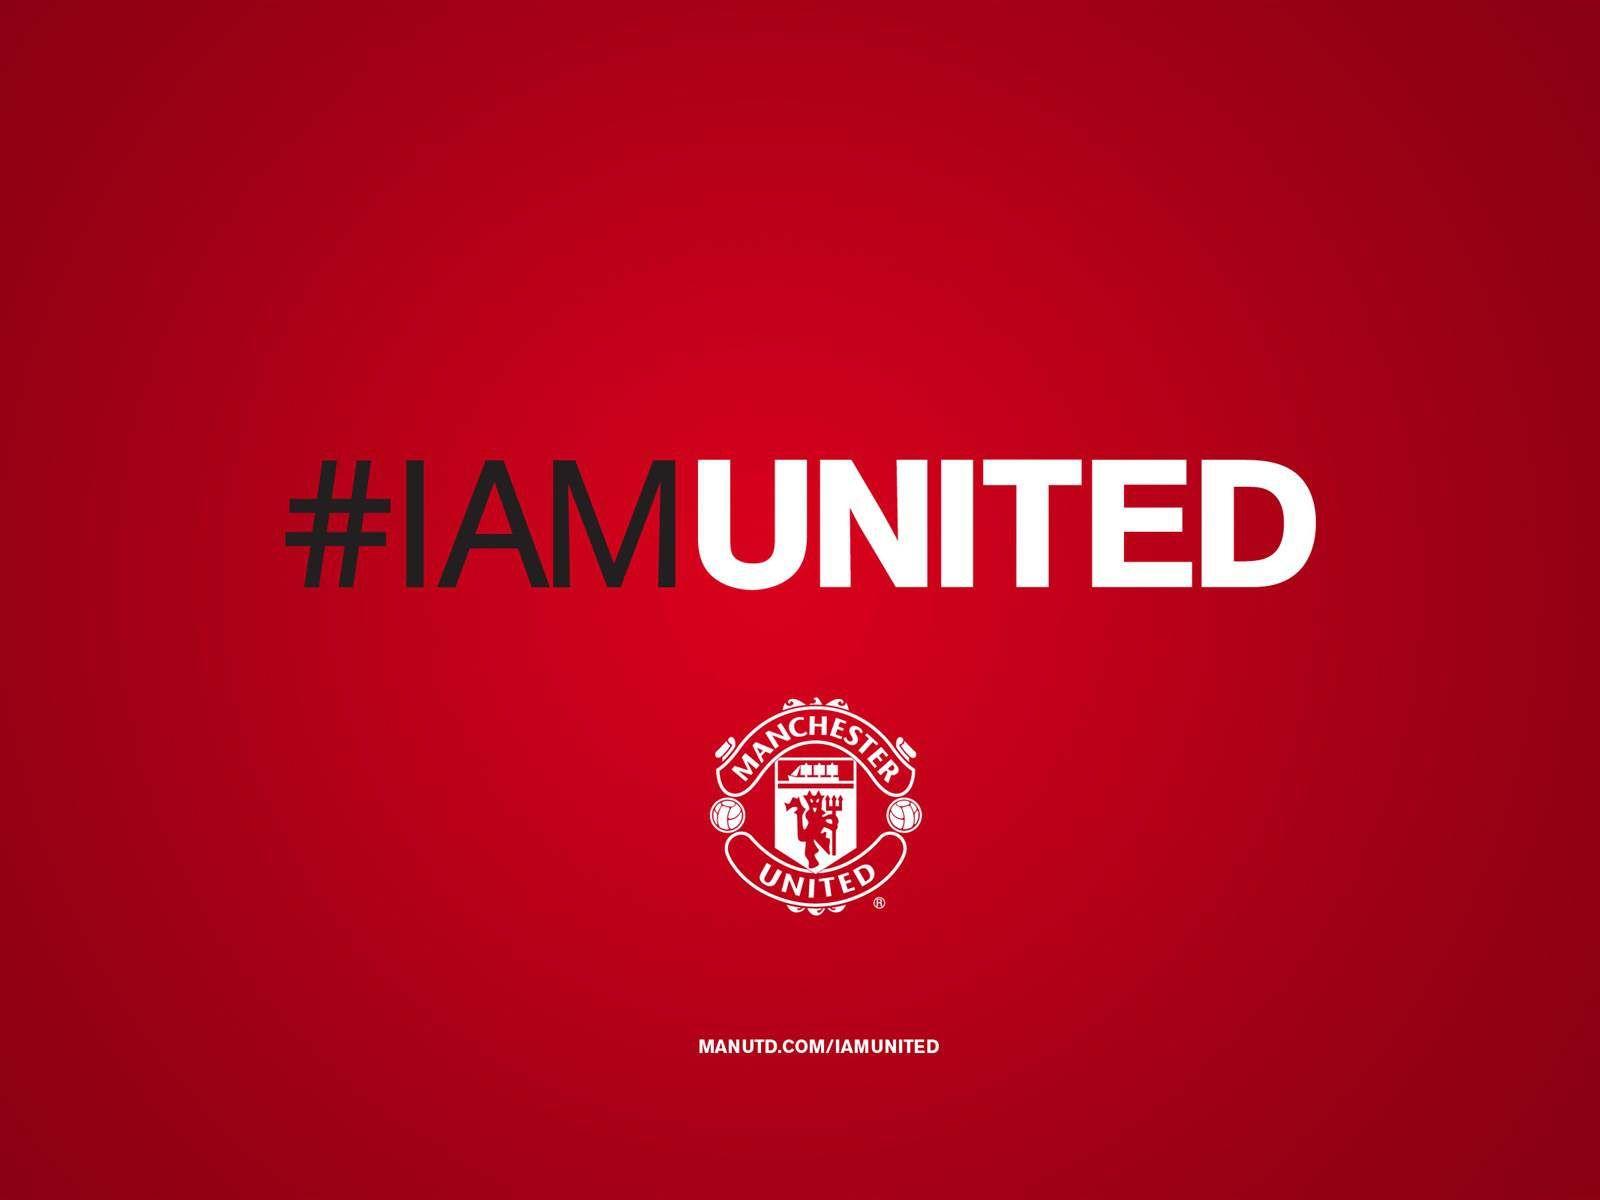 Iamunited Manchester United Manchester United Wallpaper Manchester United Logo Manchester United